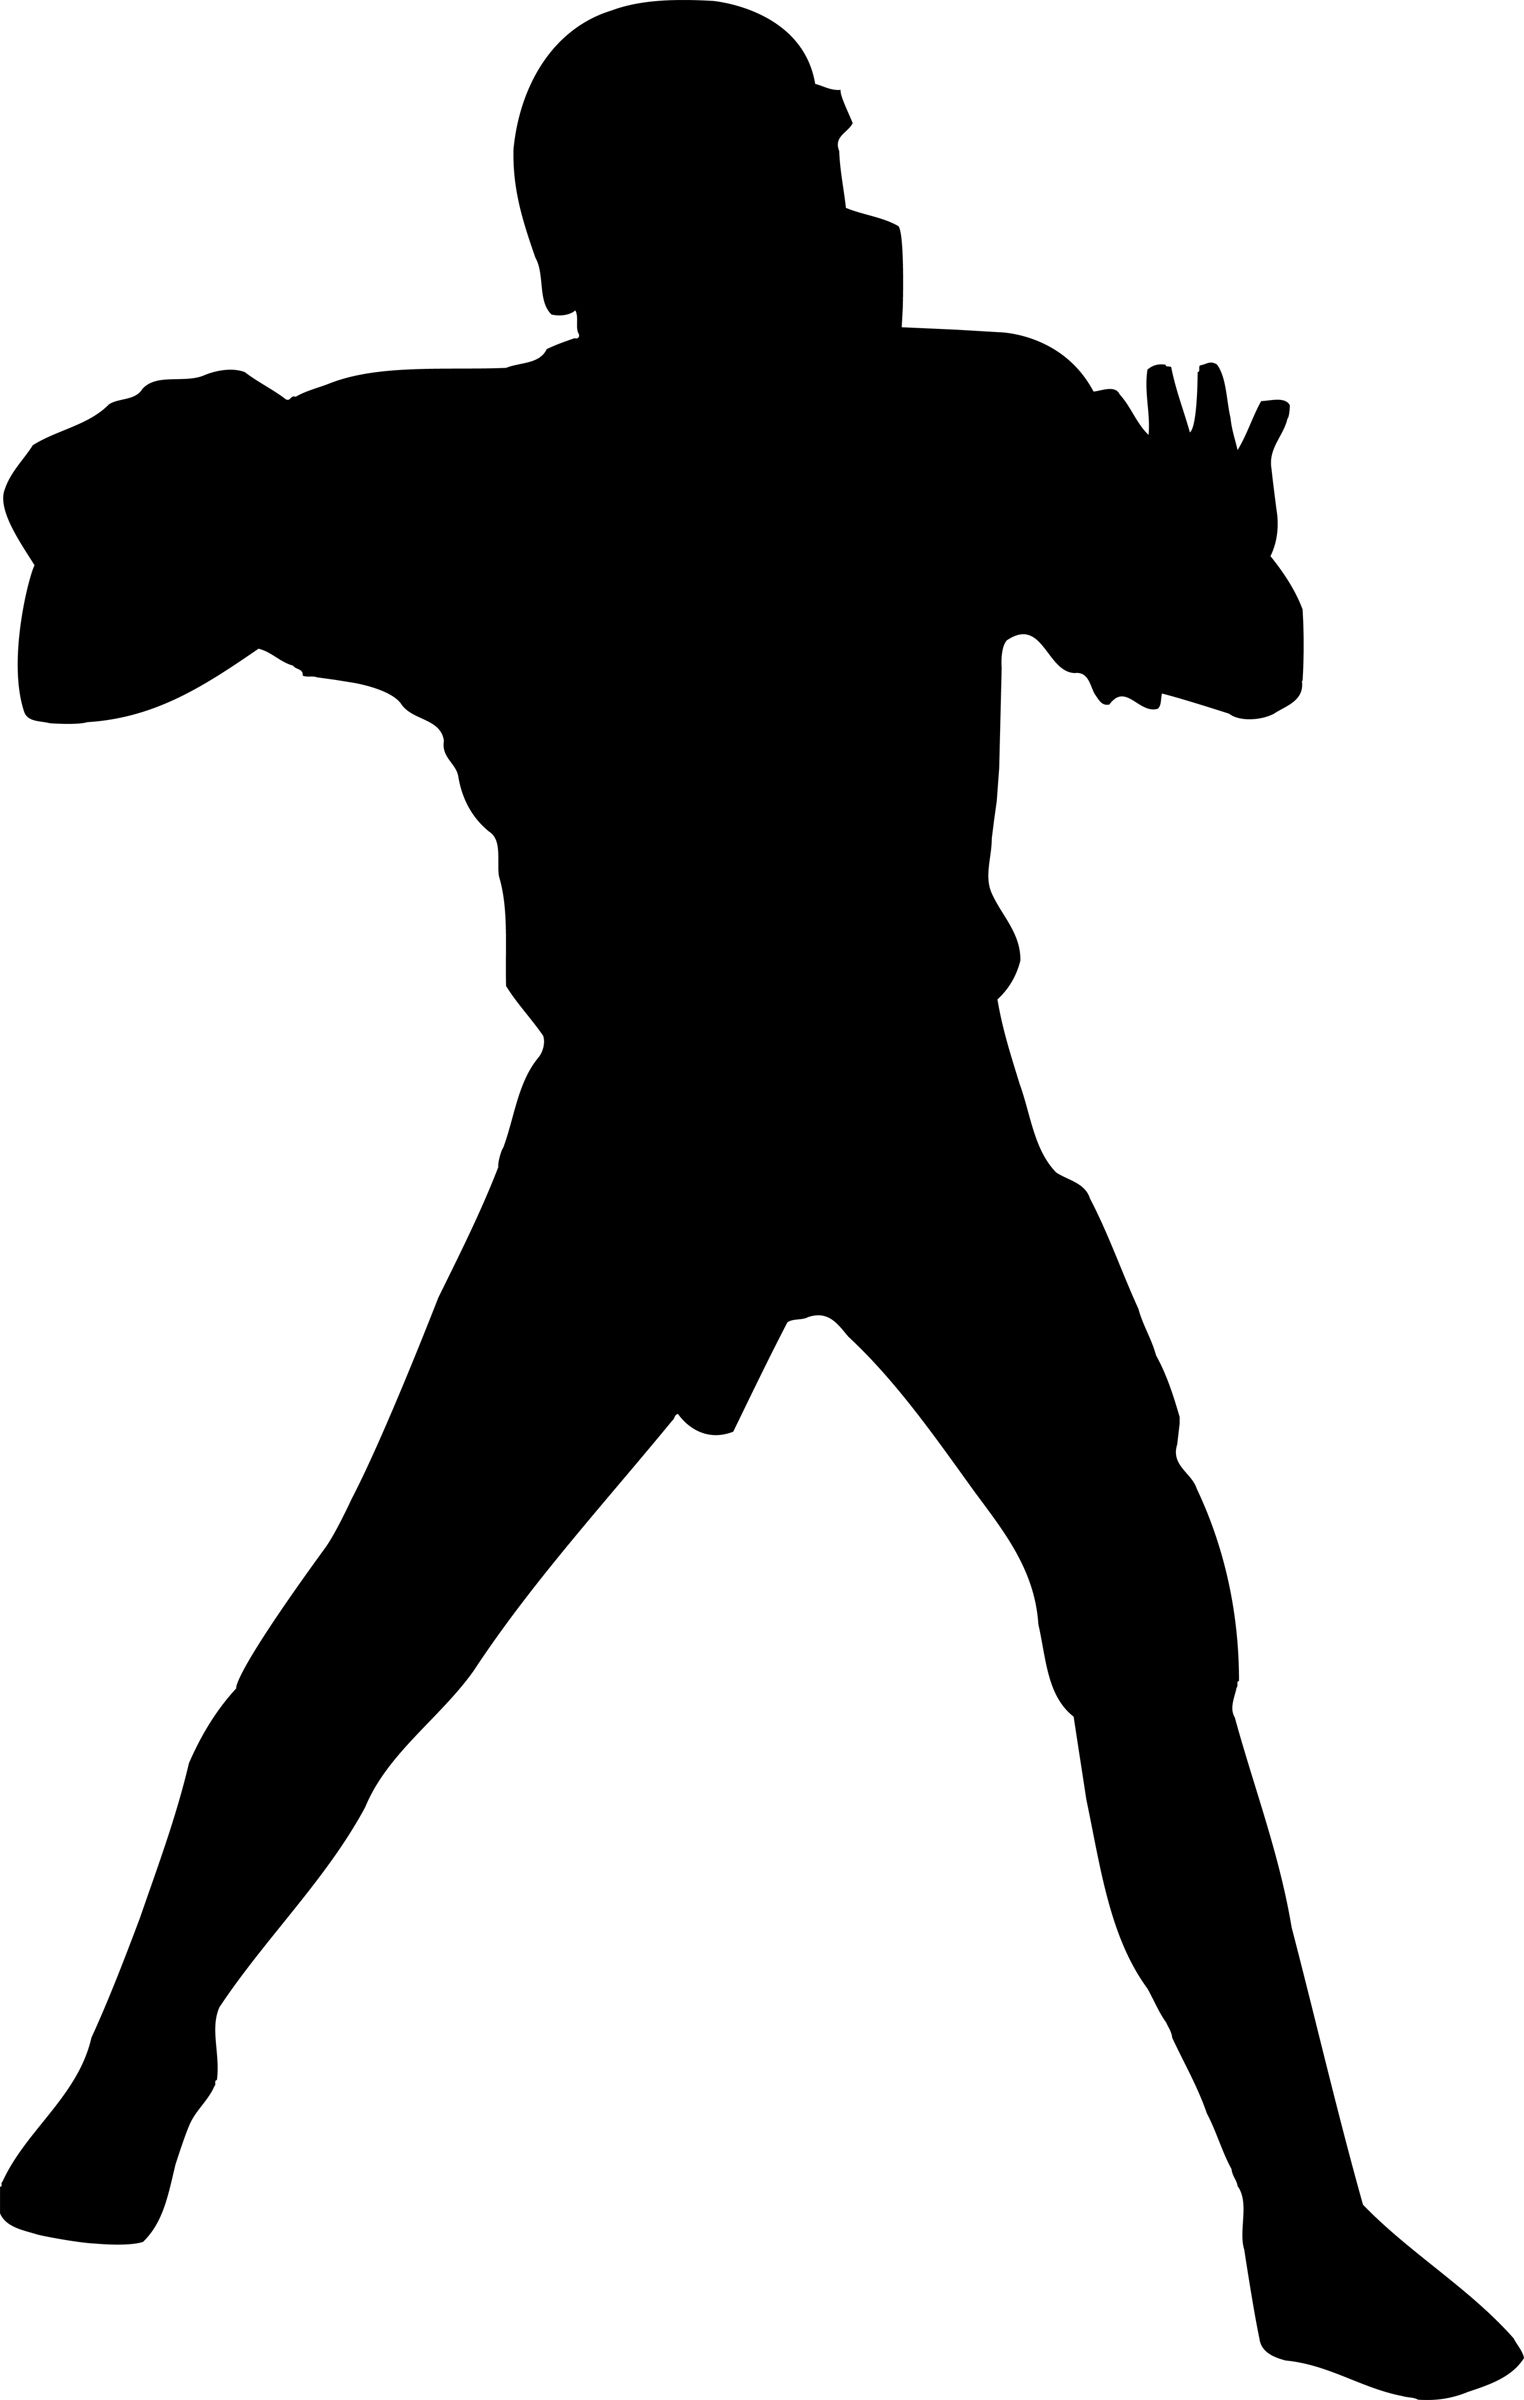 Football Player Silhouette Clip Art | Varsity Football | SPORTS ...